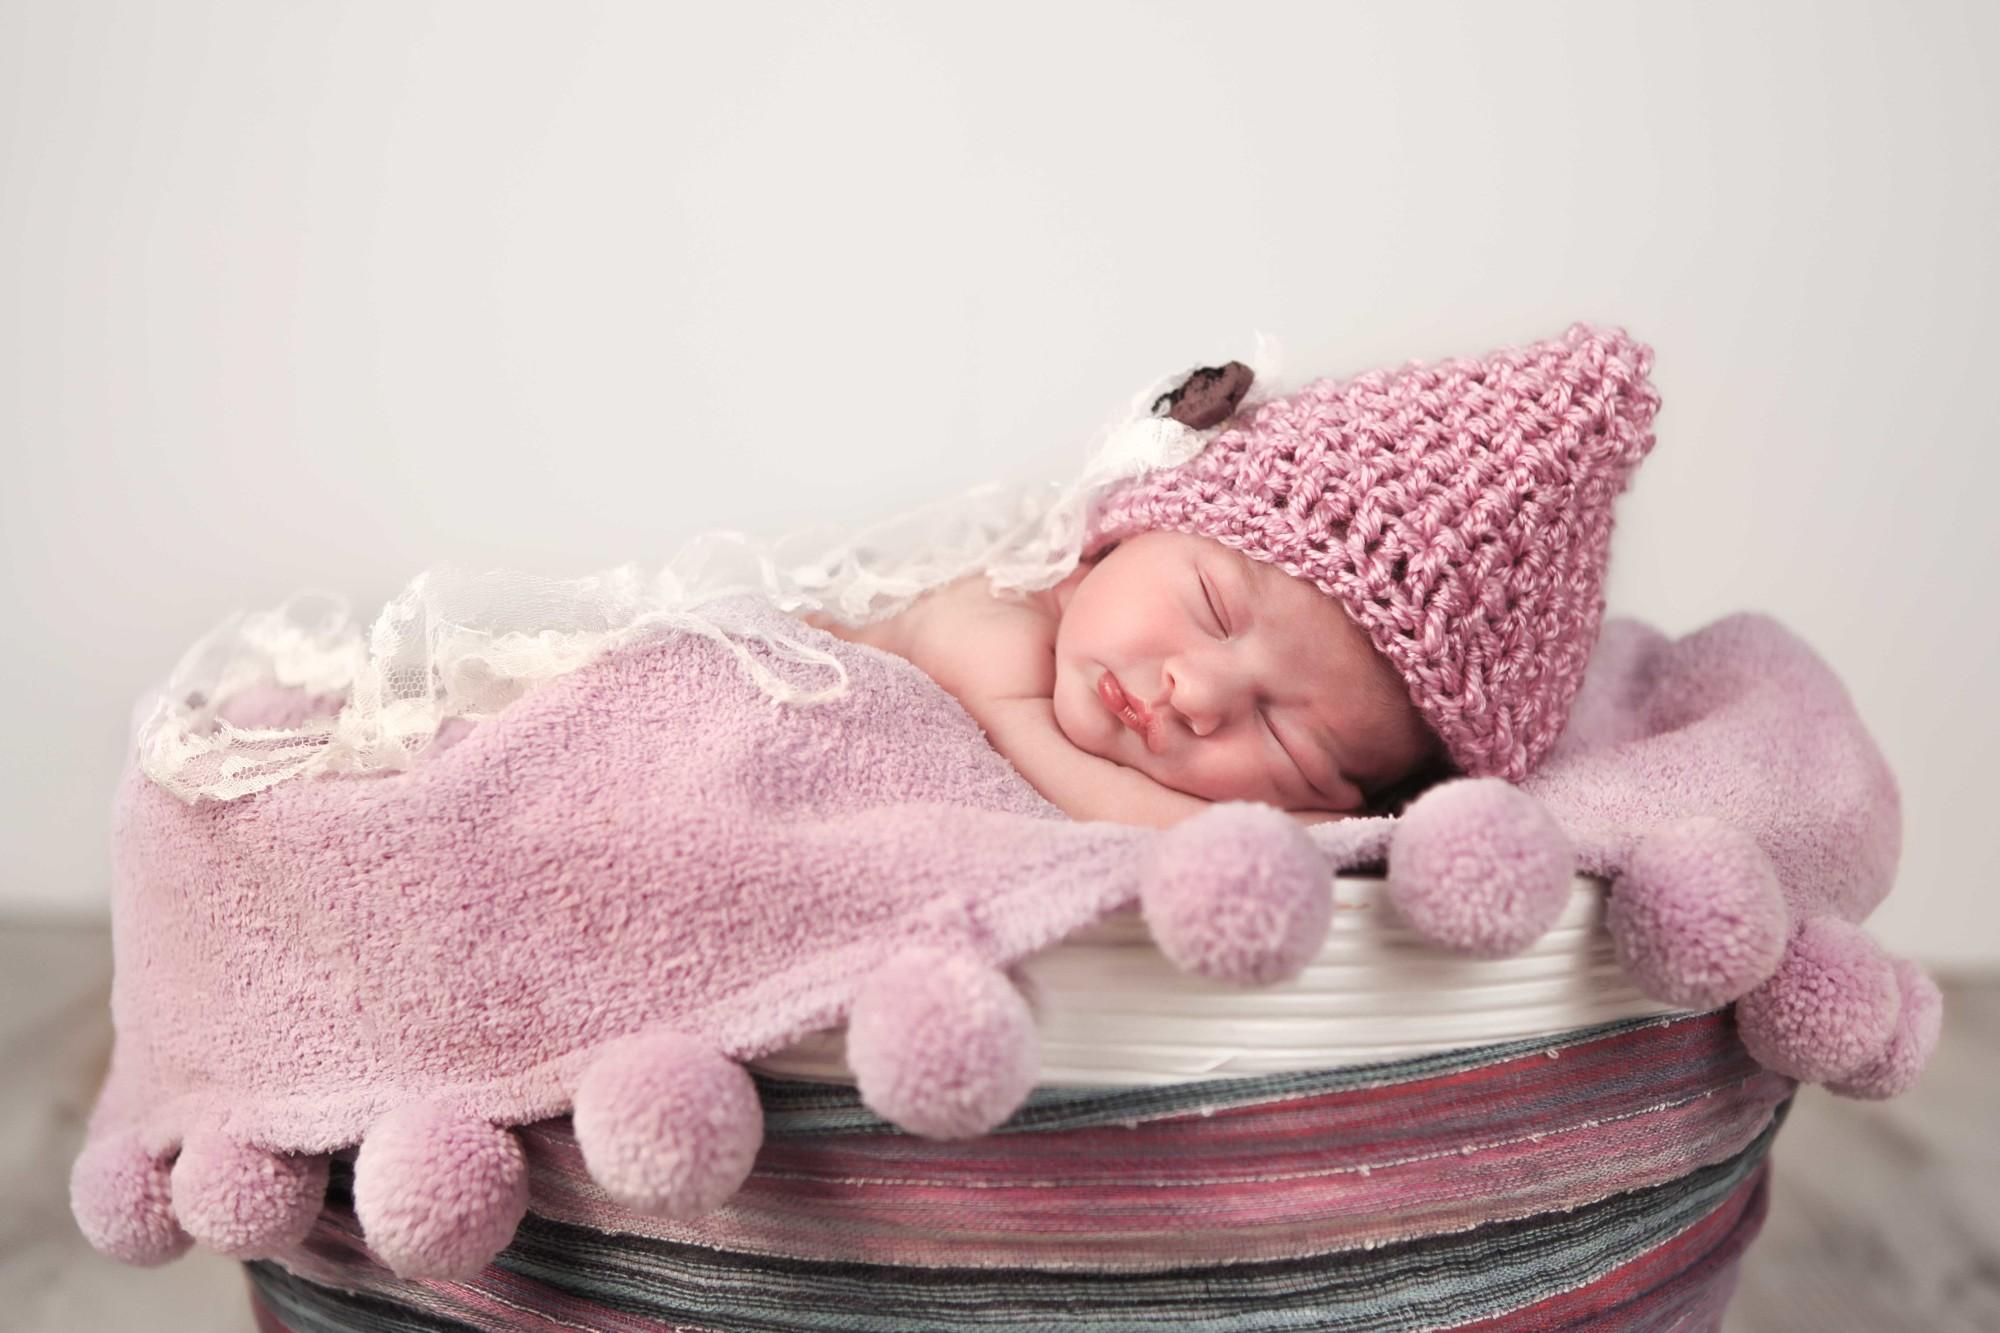 sesion bebes, new born, granada recien nacidos 1